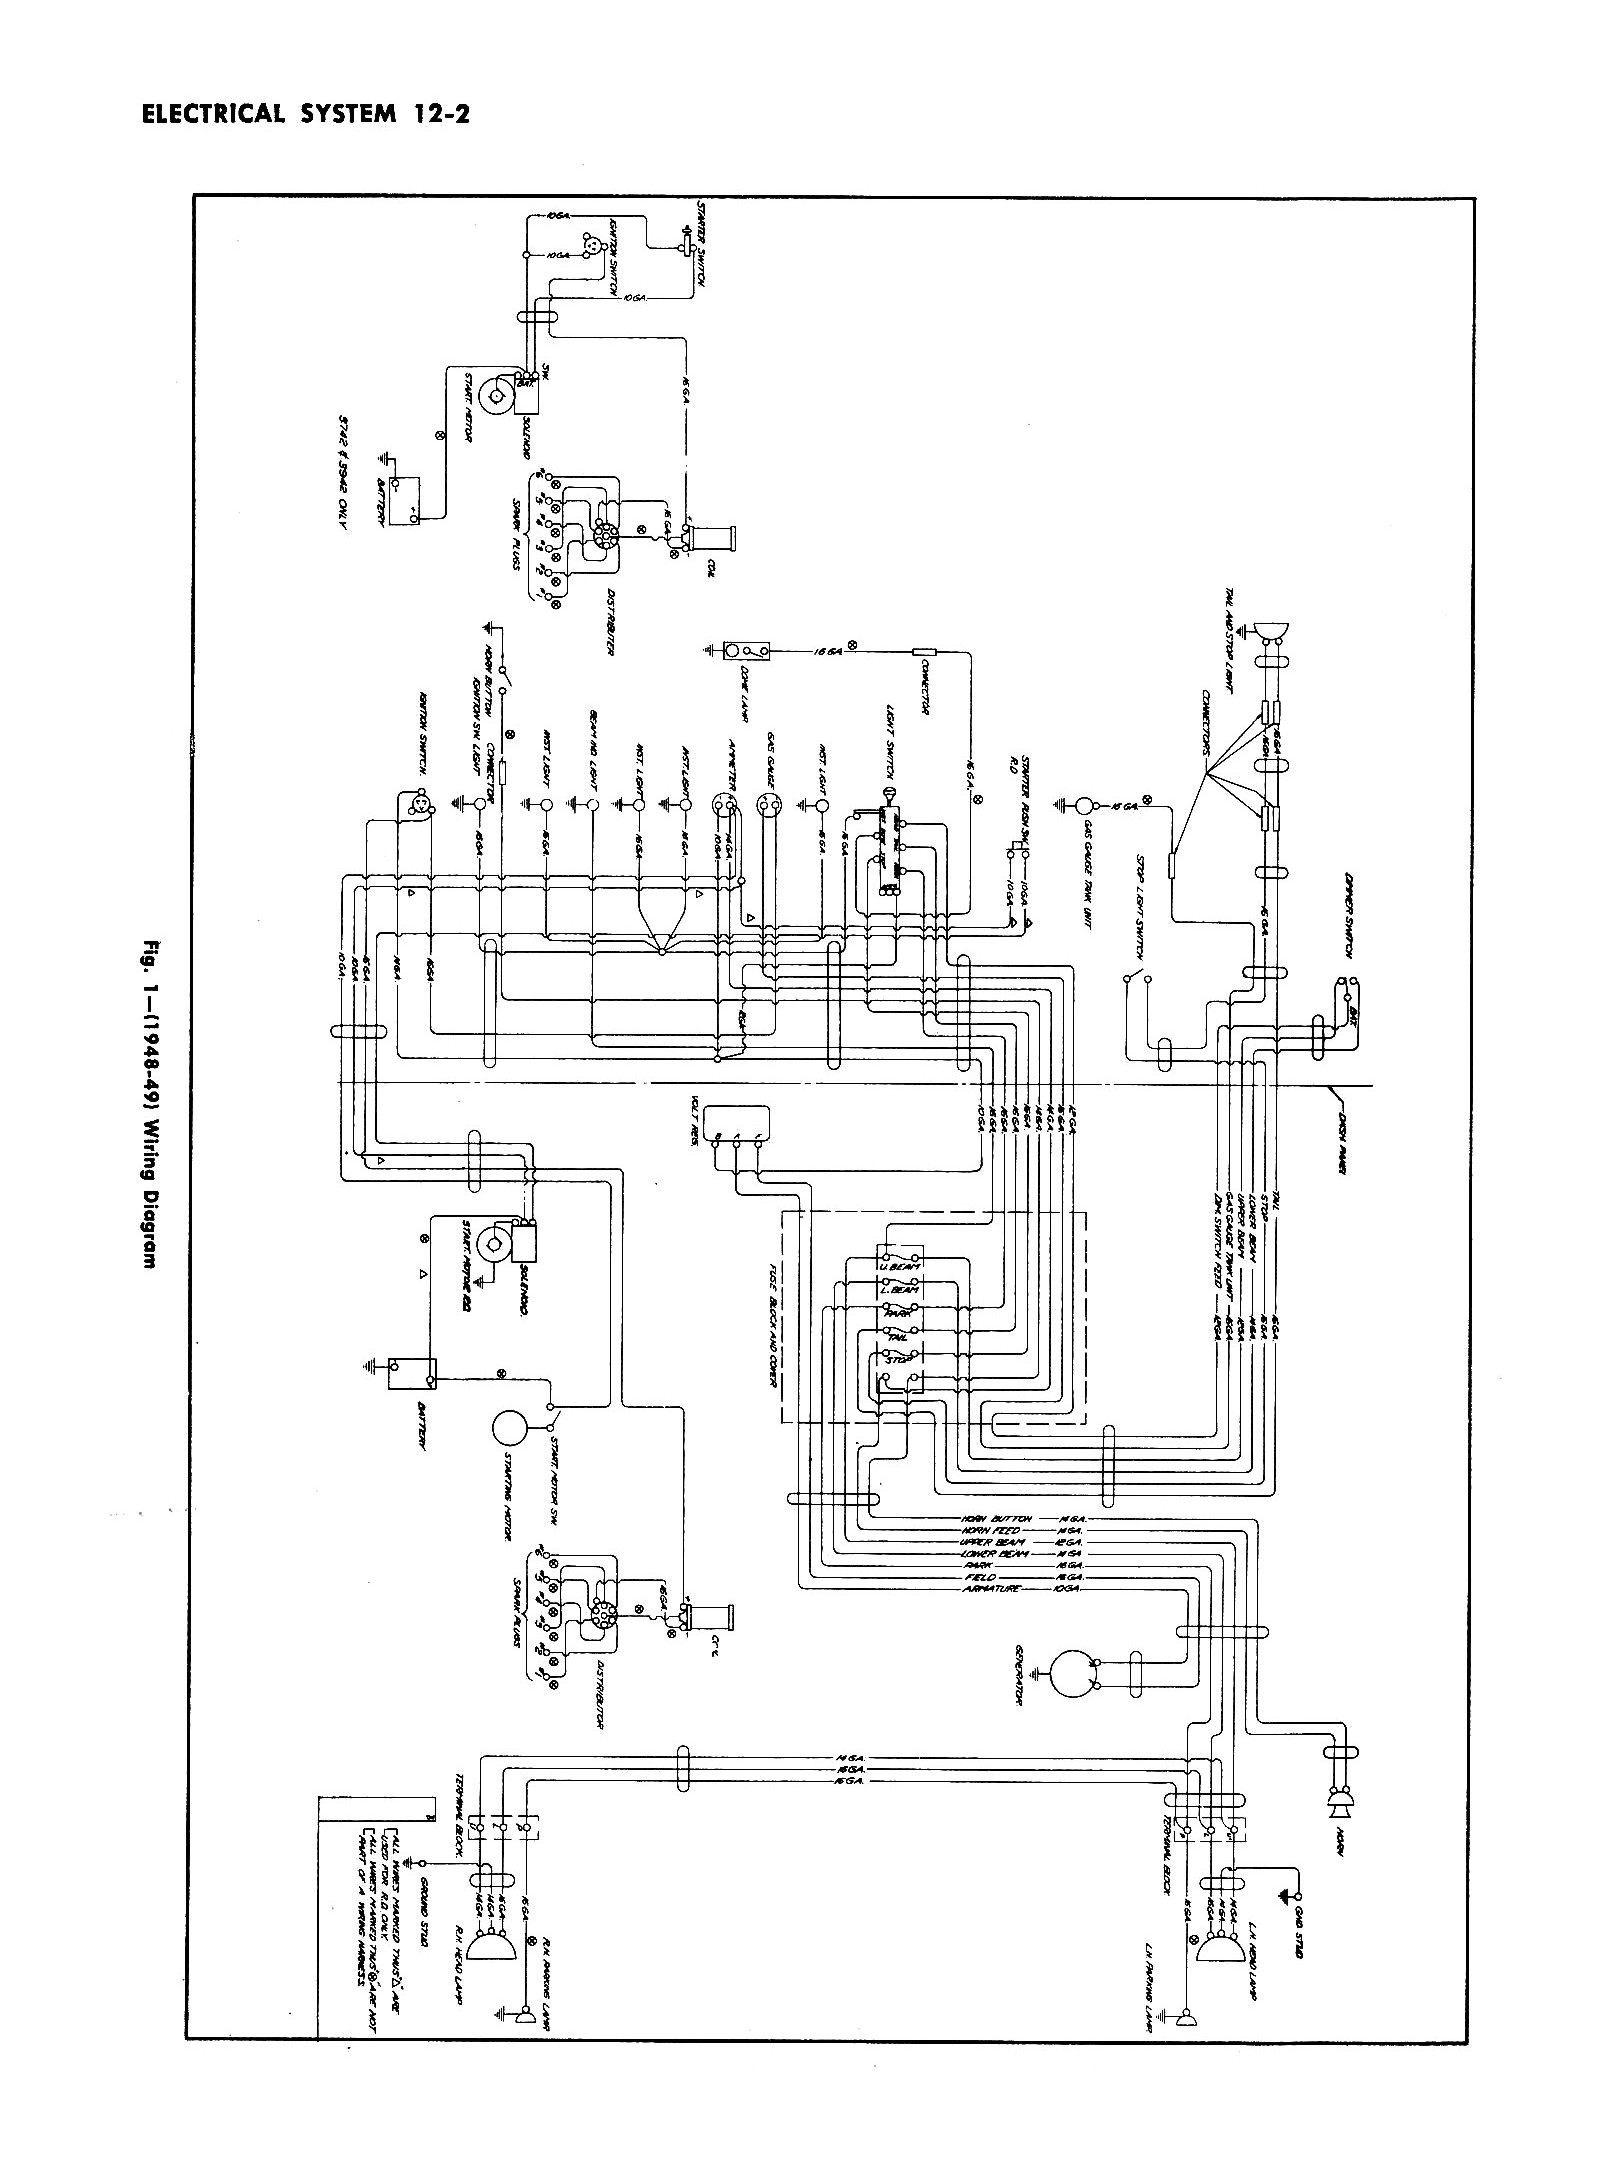 Chevy Steering Column Wiring Diagram